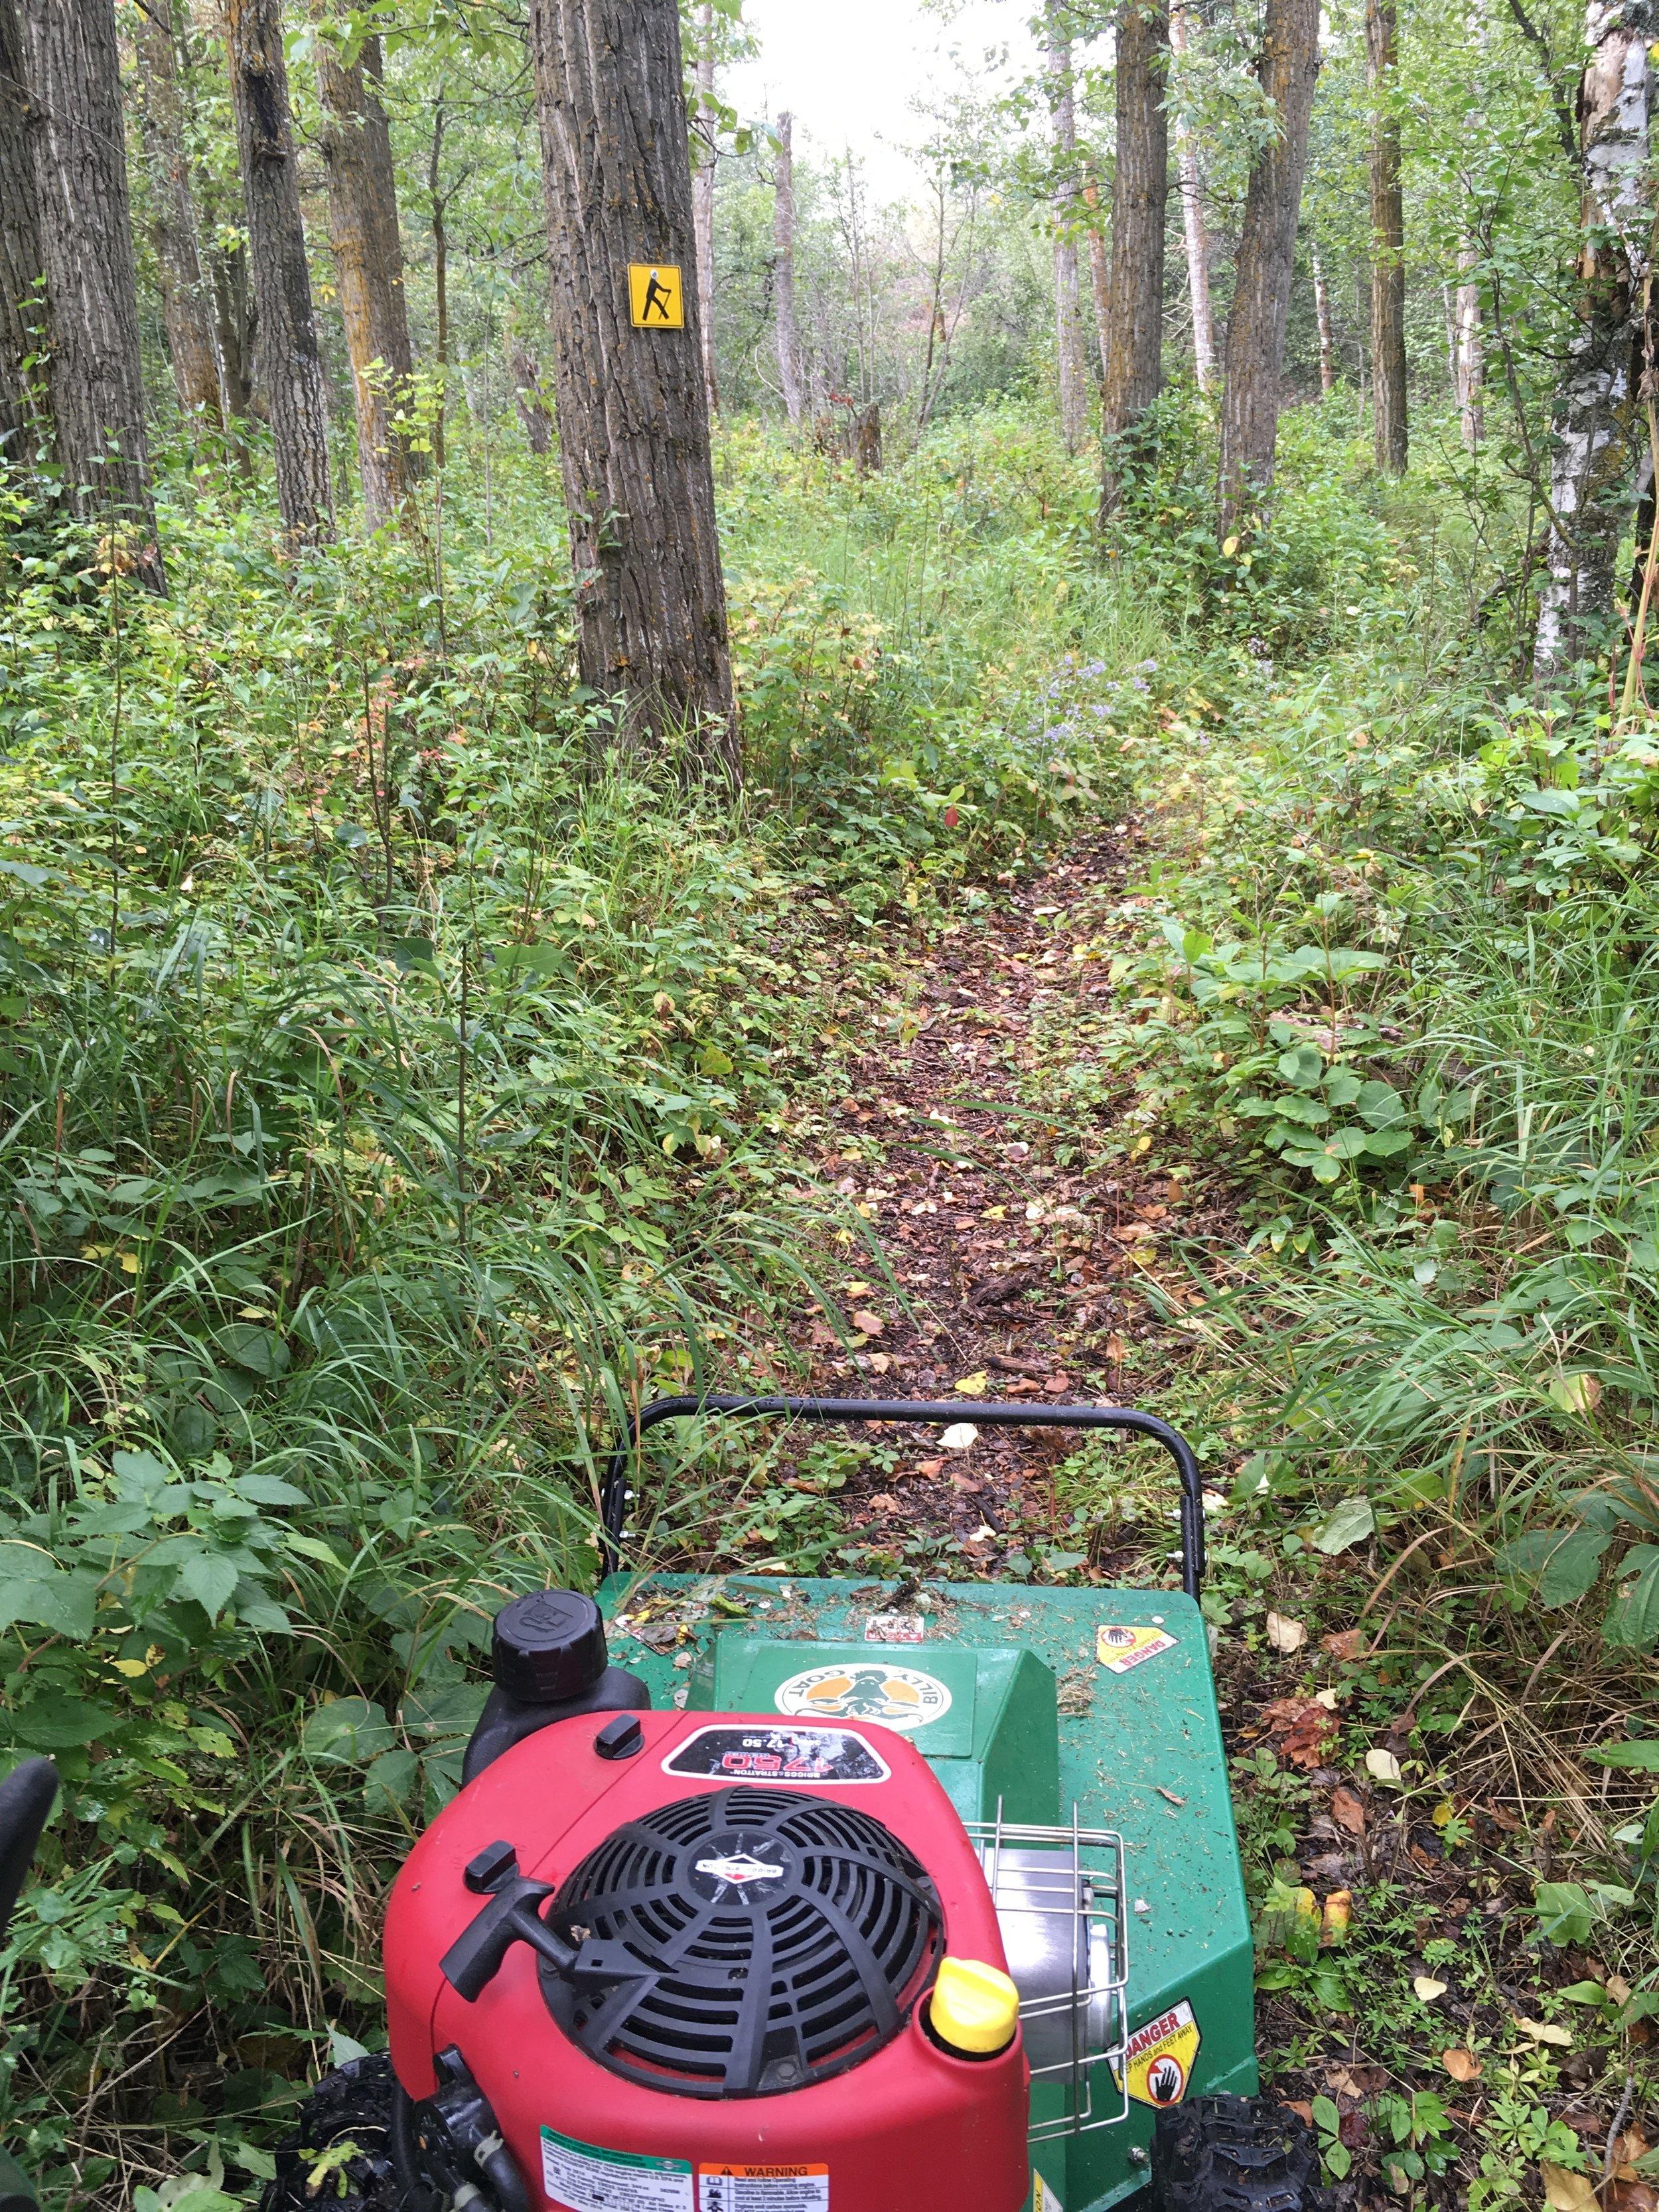 Volunteers helped maintain the trails at Boisvert's Greenwoods